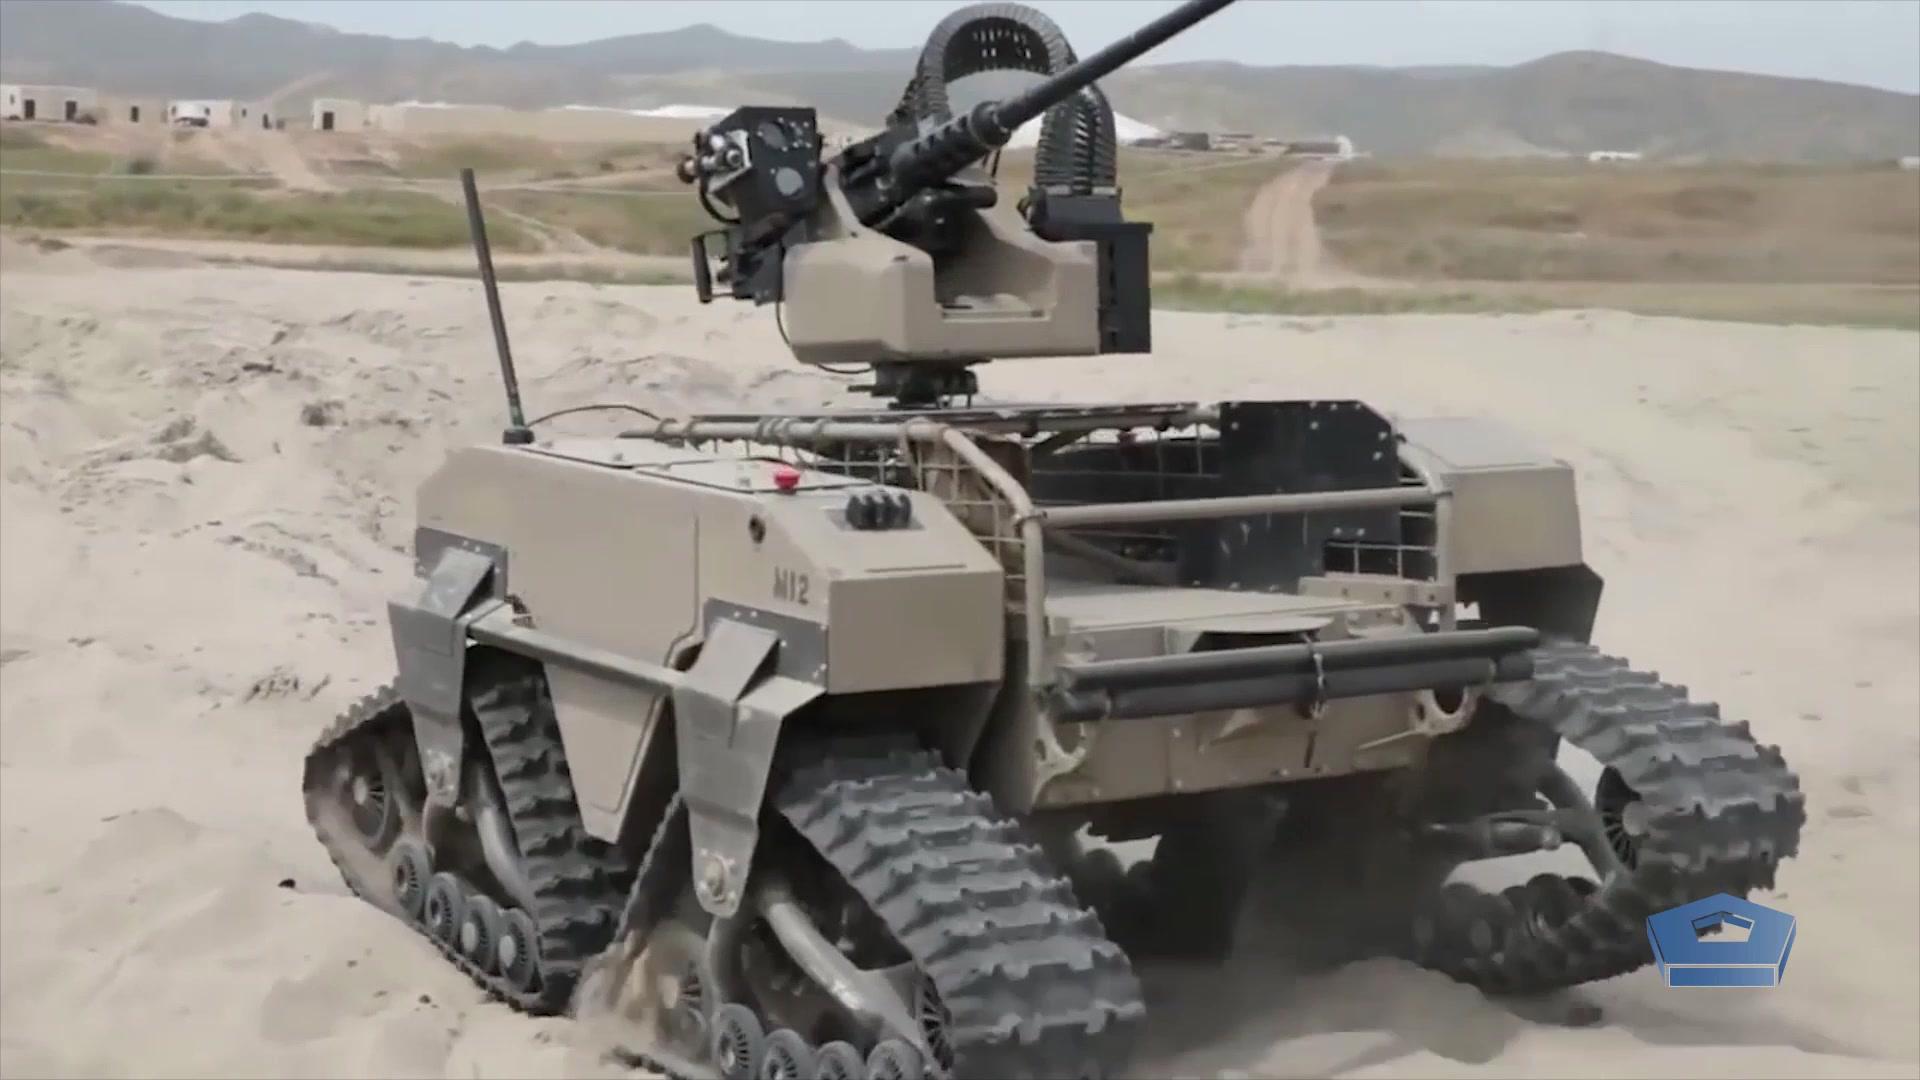 A futuristic tank sits on some sand.